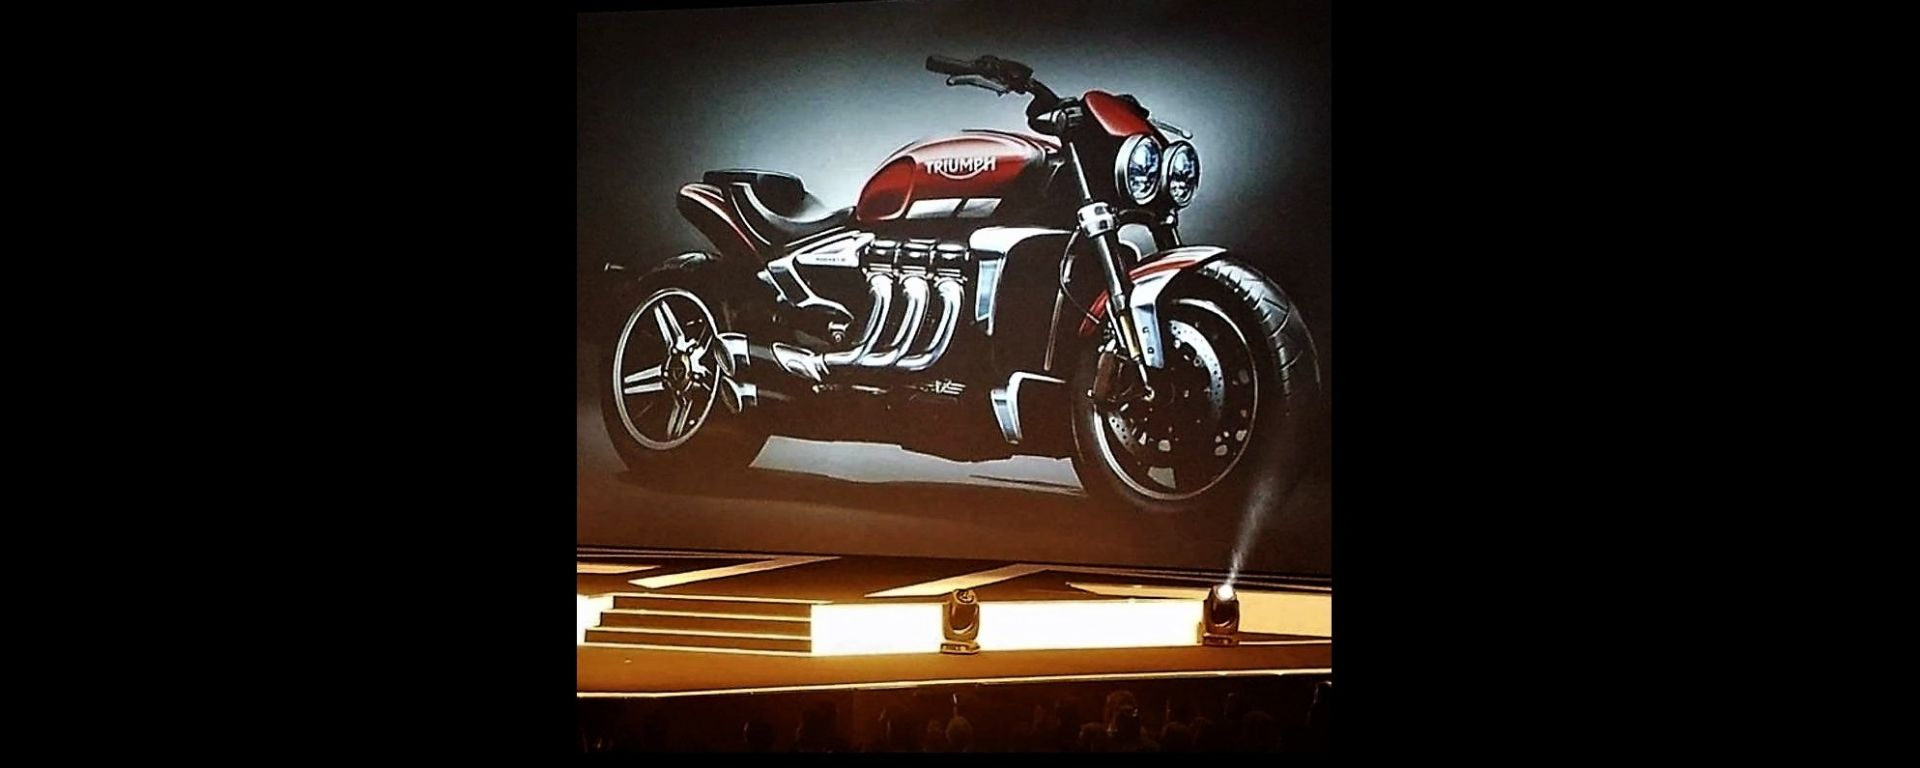 Nuova Triumph Rocket III Roadster 2019 concept